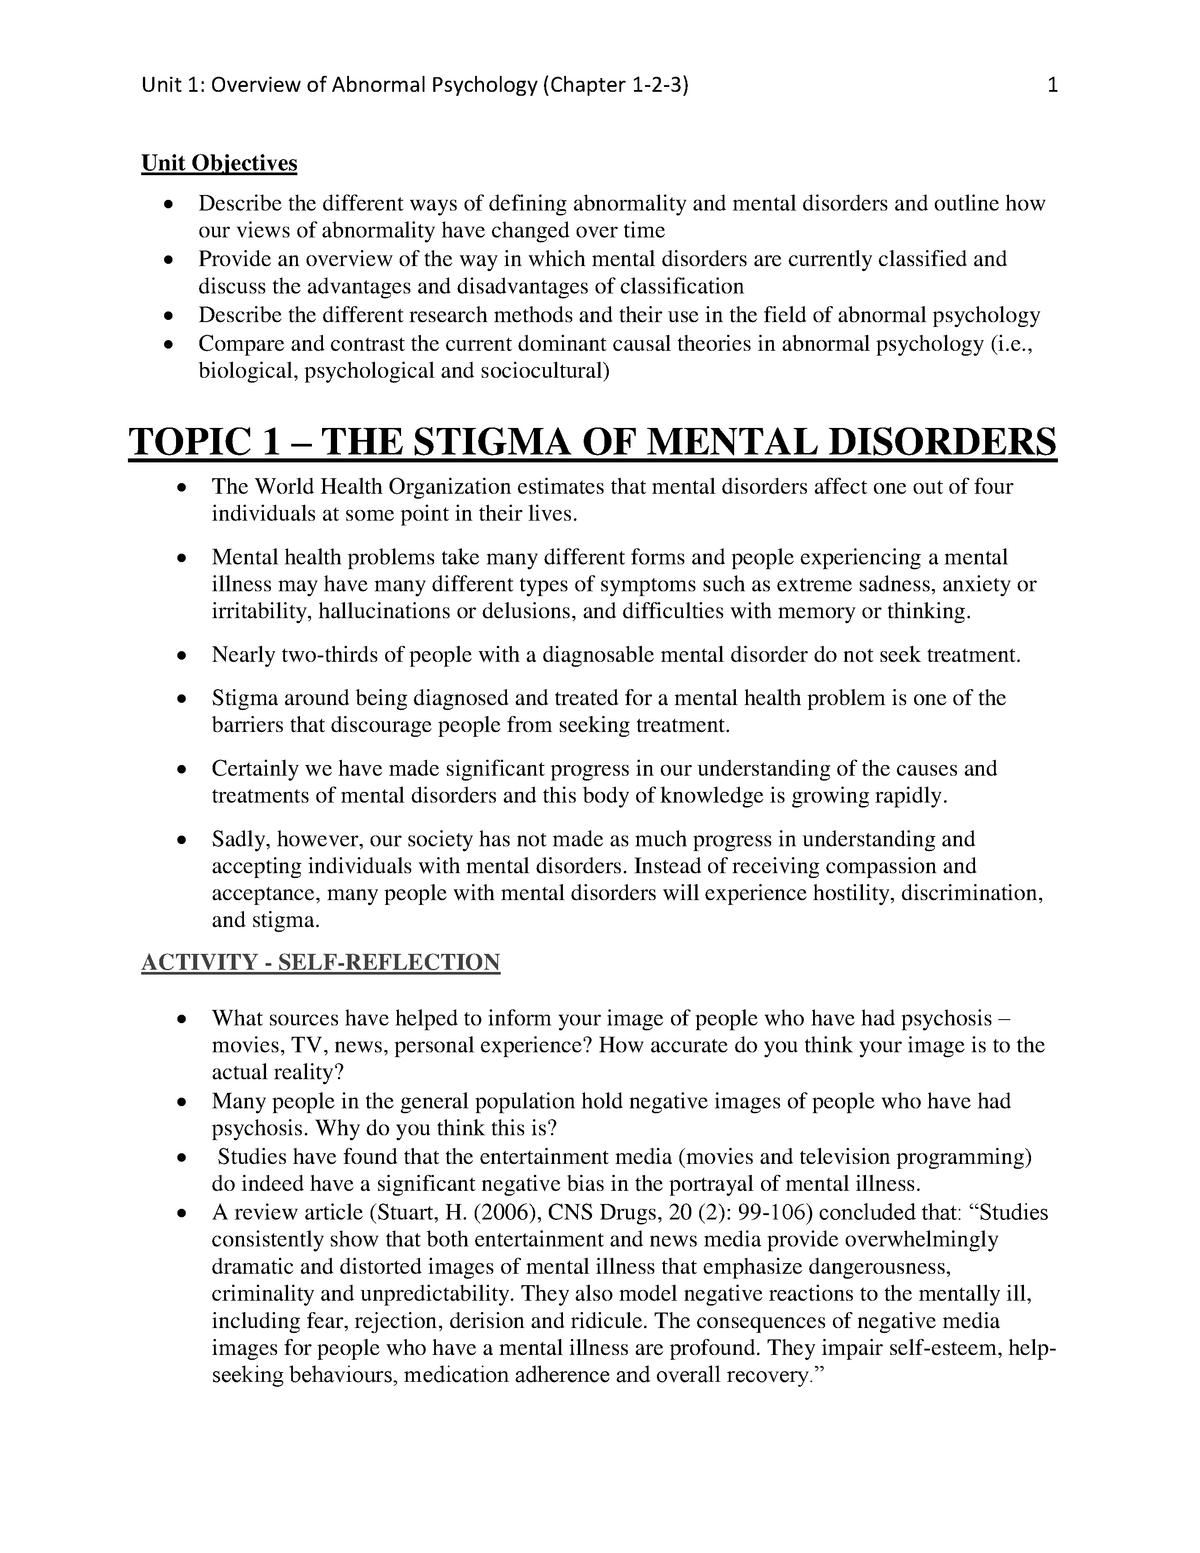 Summary Abnormal Psychology - Unit 1-4 - PSYC 300A - UBC